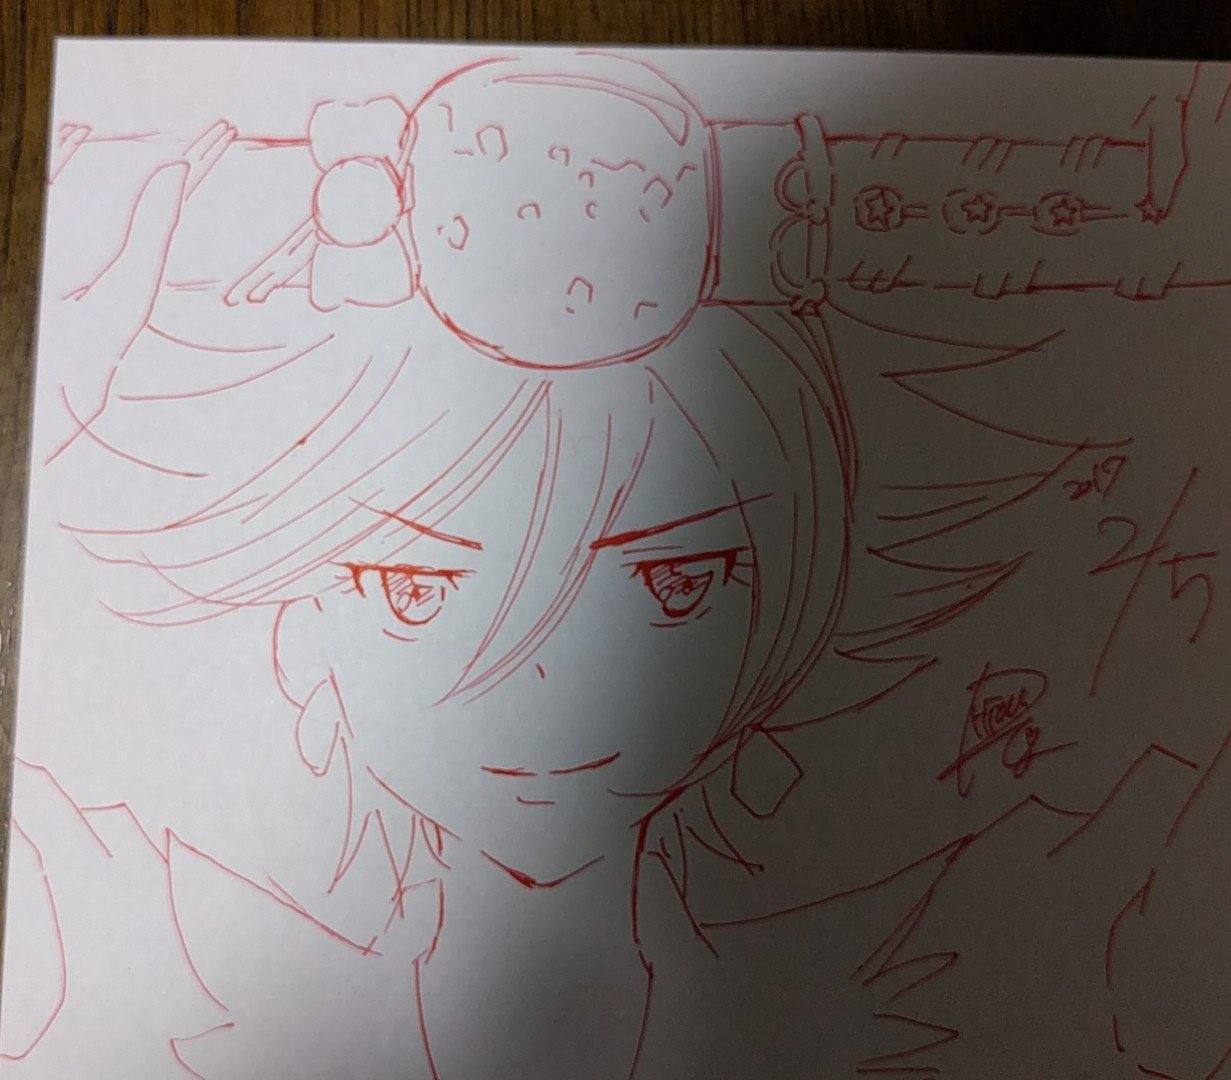 HizuRu_@キング (@HizuRu_)さんのイラスト